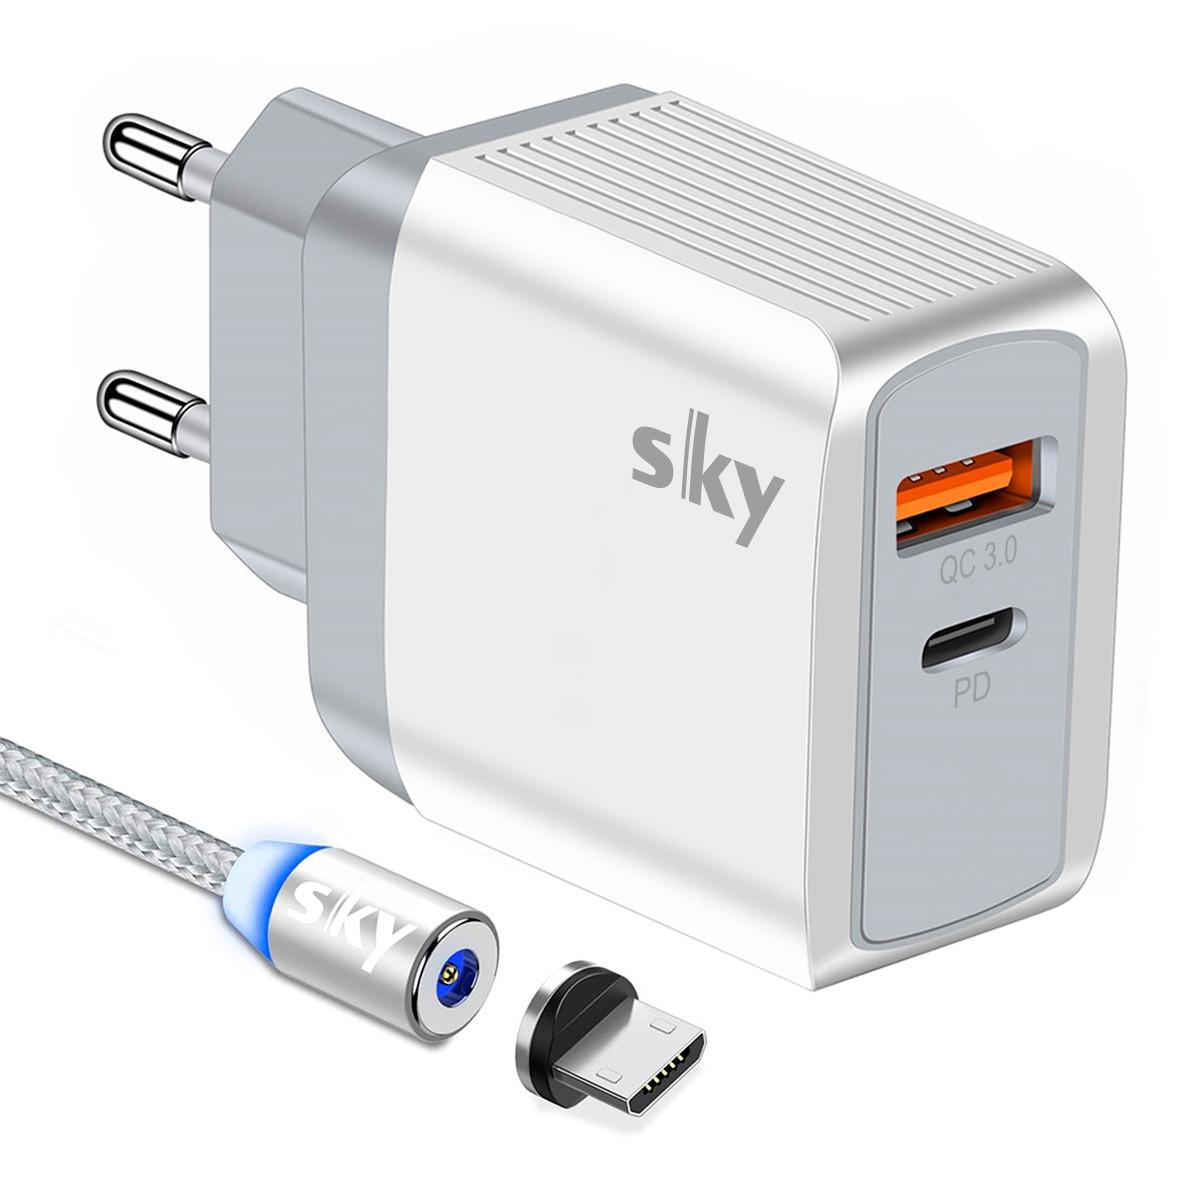 Зарядное устройство SKY (E 05) QC / PD (20W) White